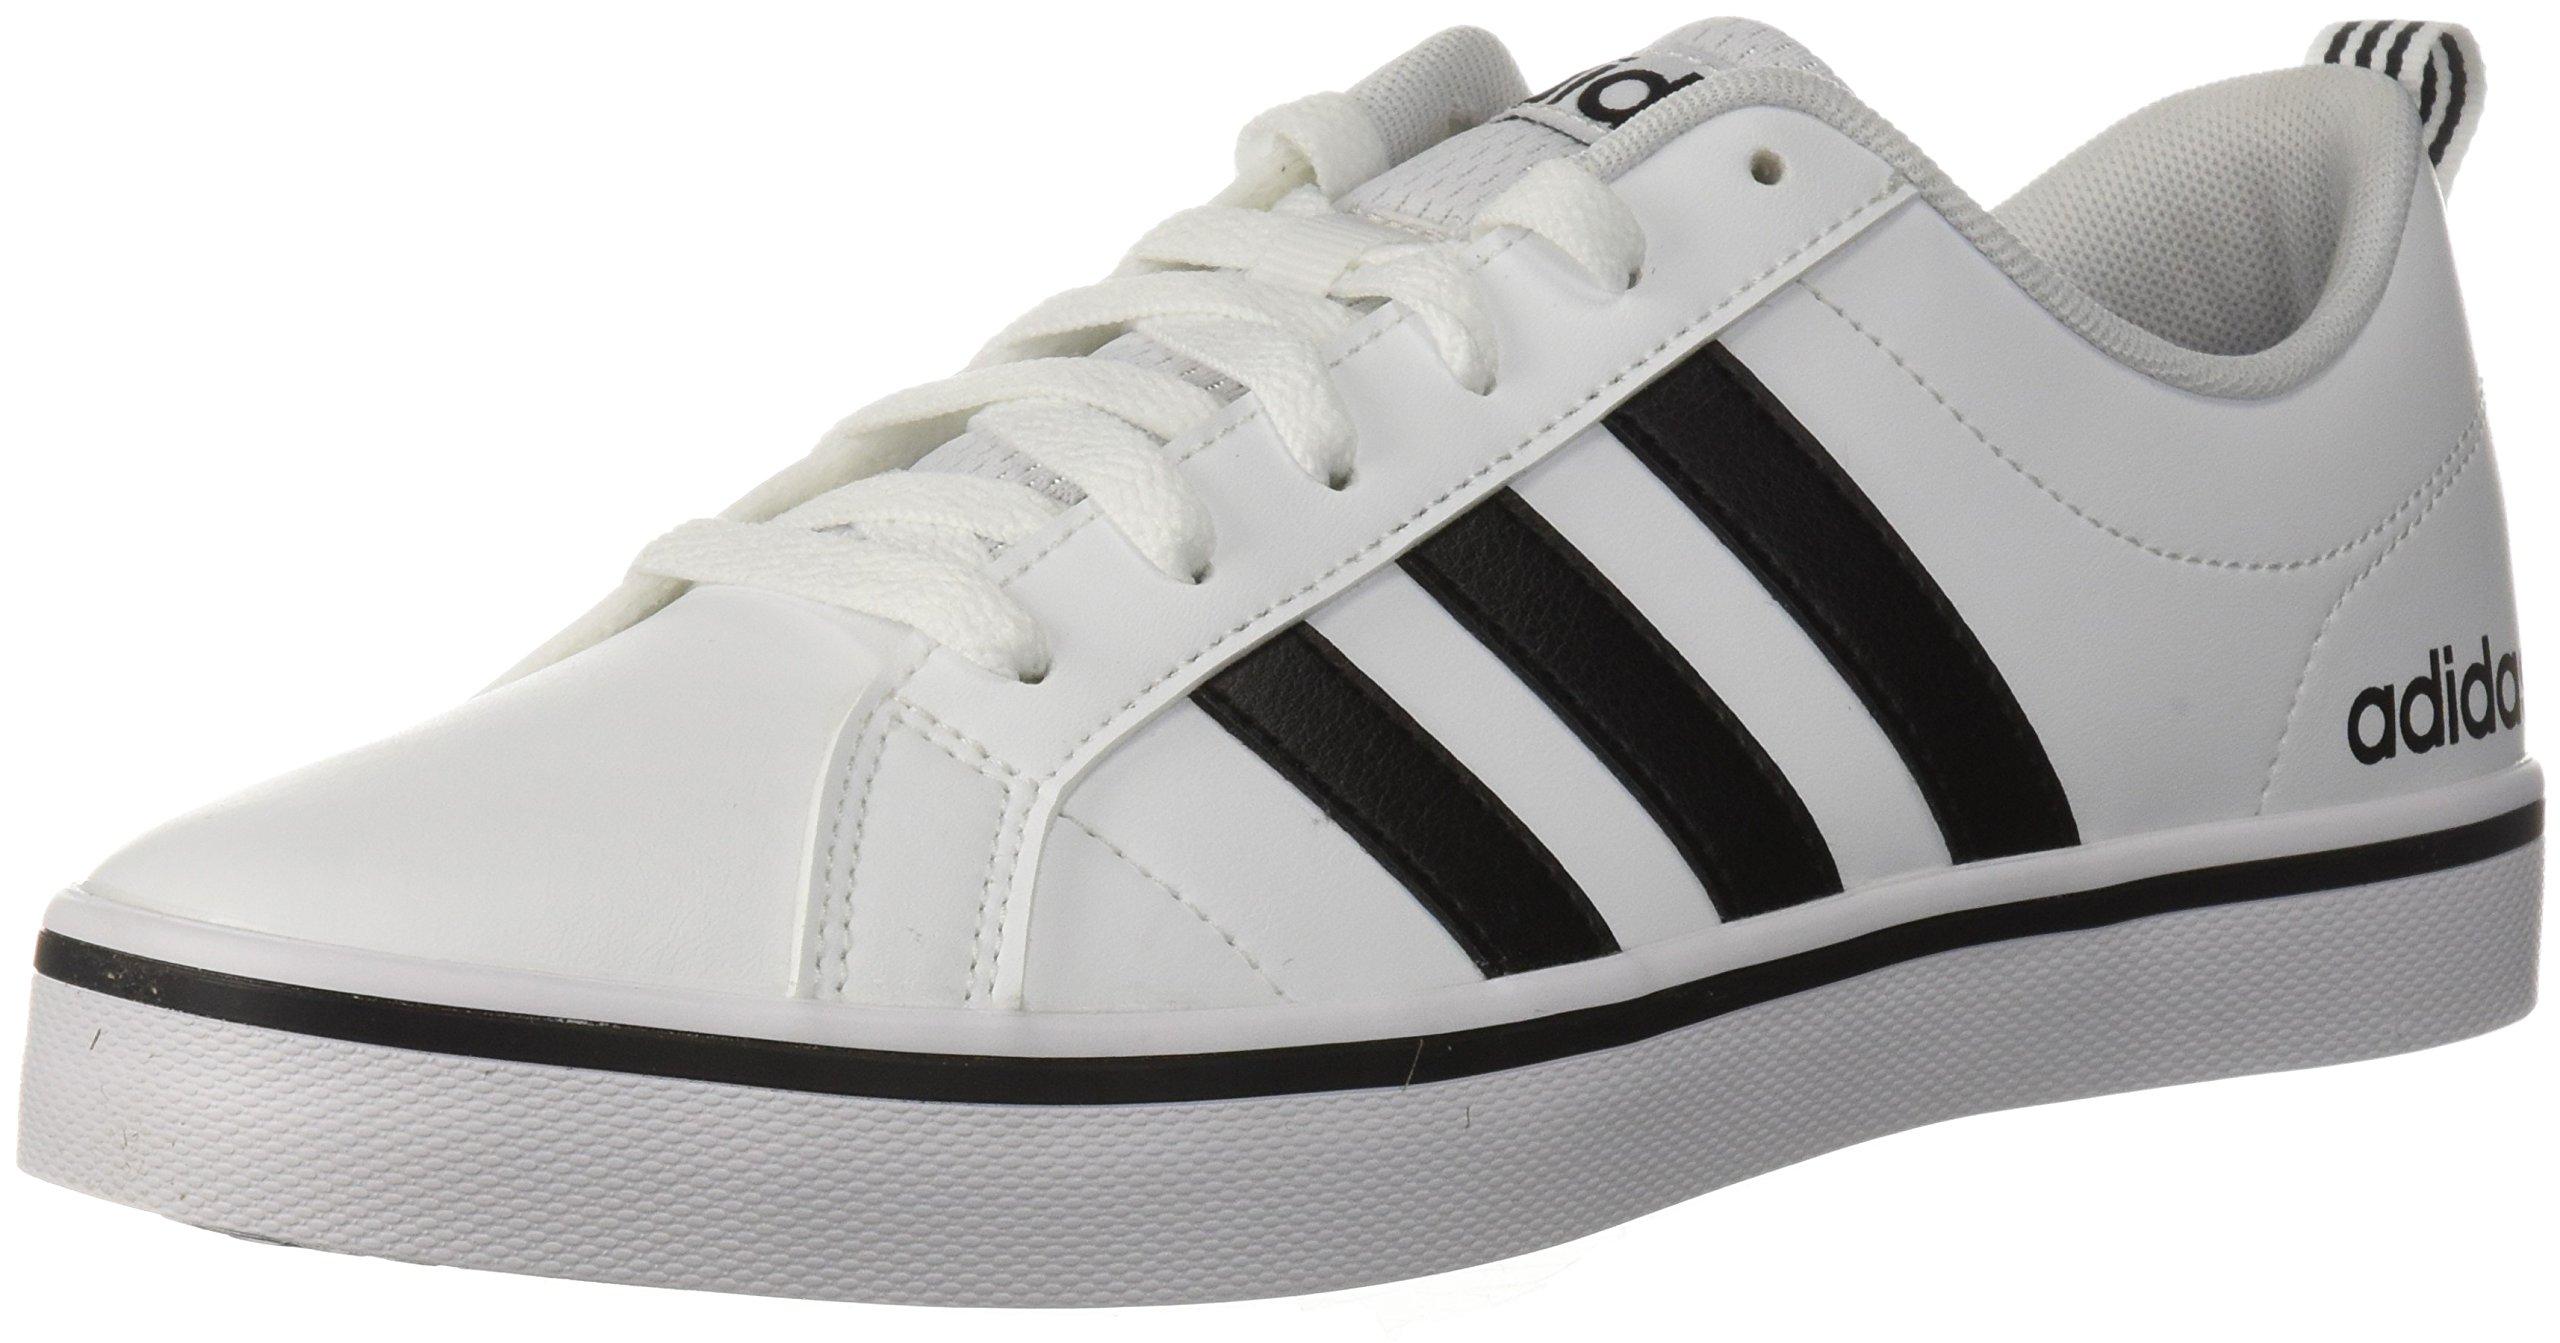 7d4ca1bbe00 Galleon - Adidas Men s Vs Pace Sneaker